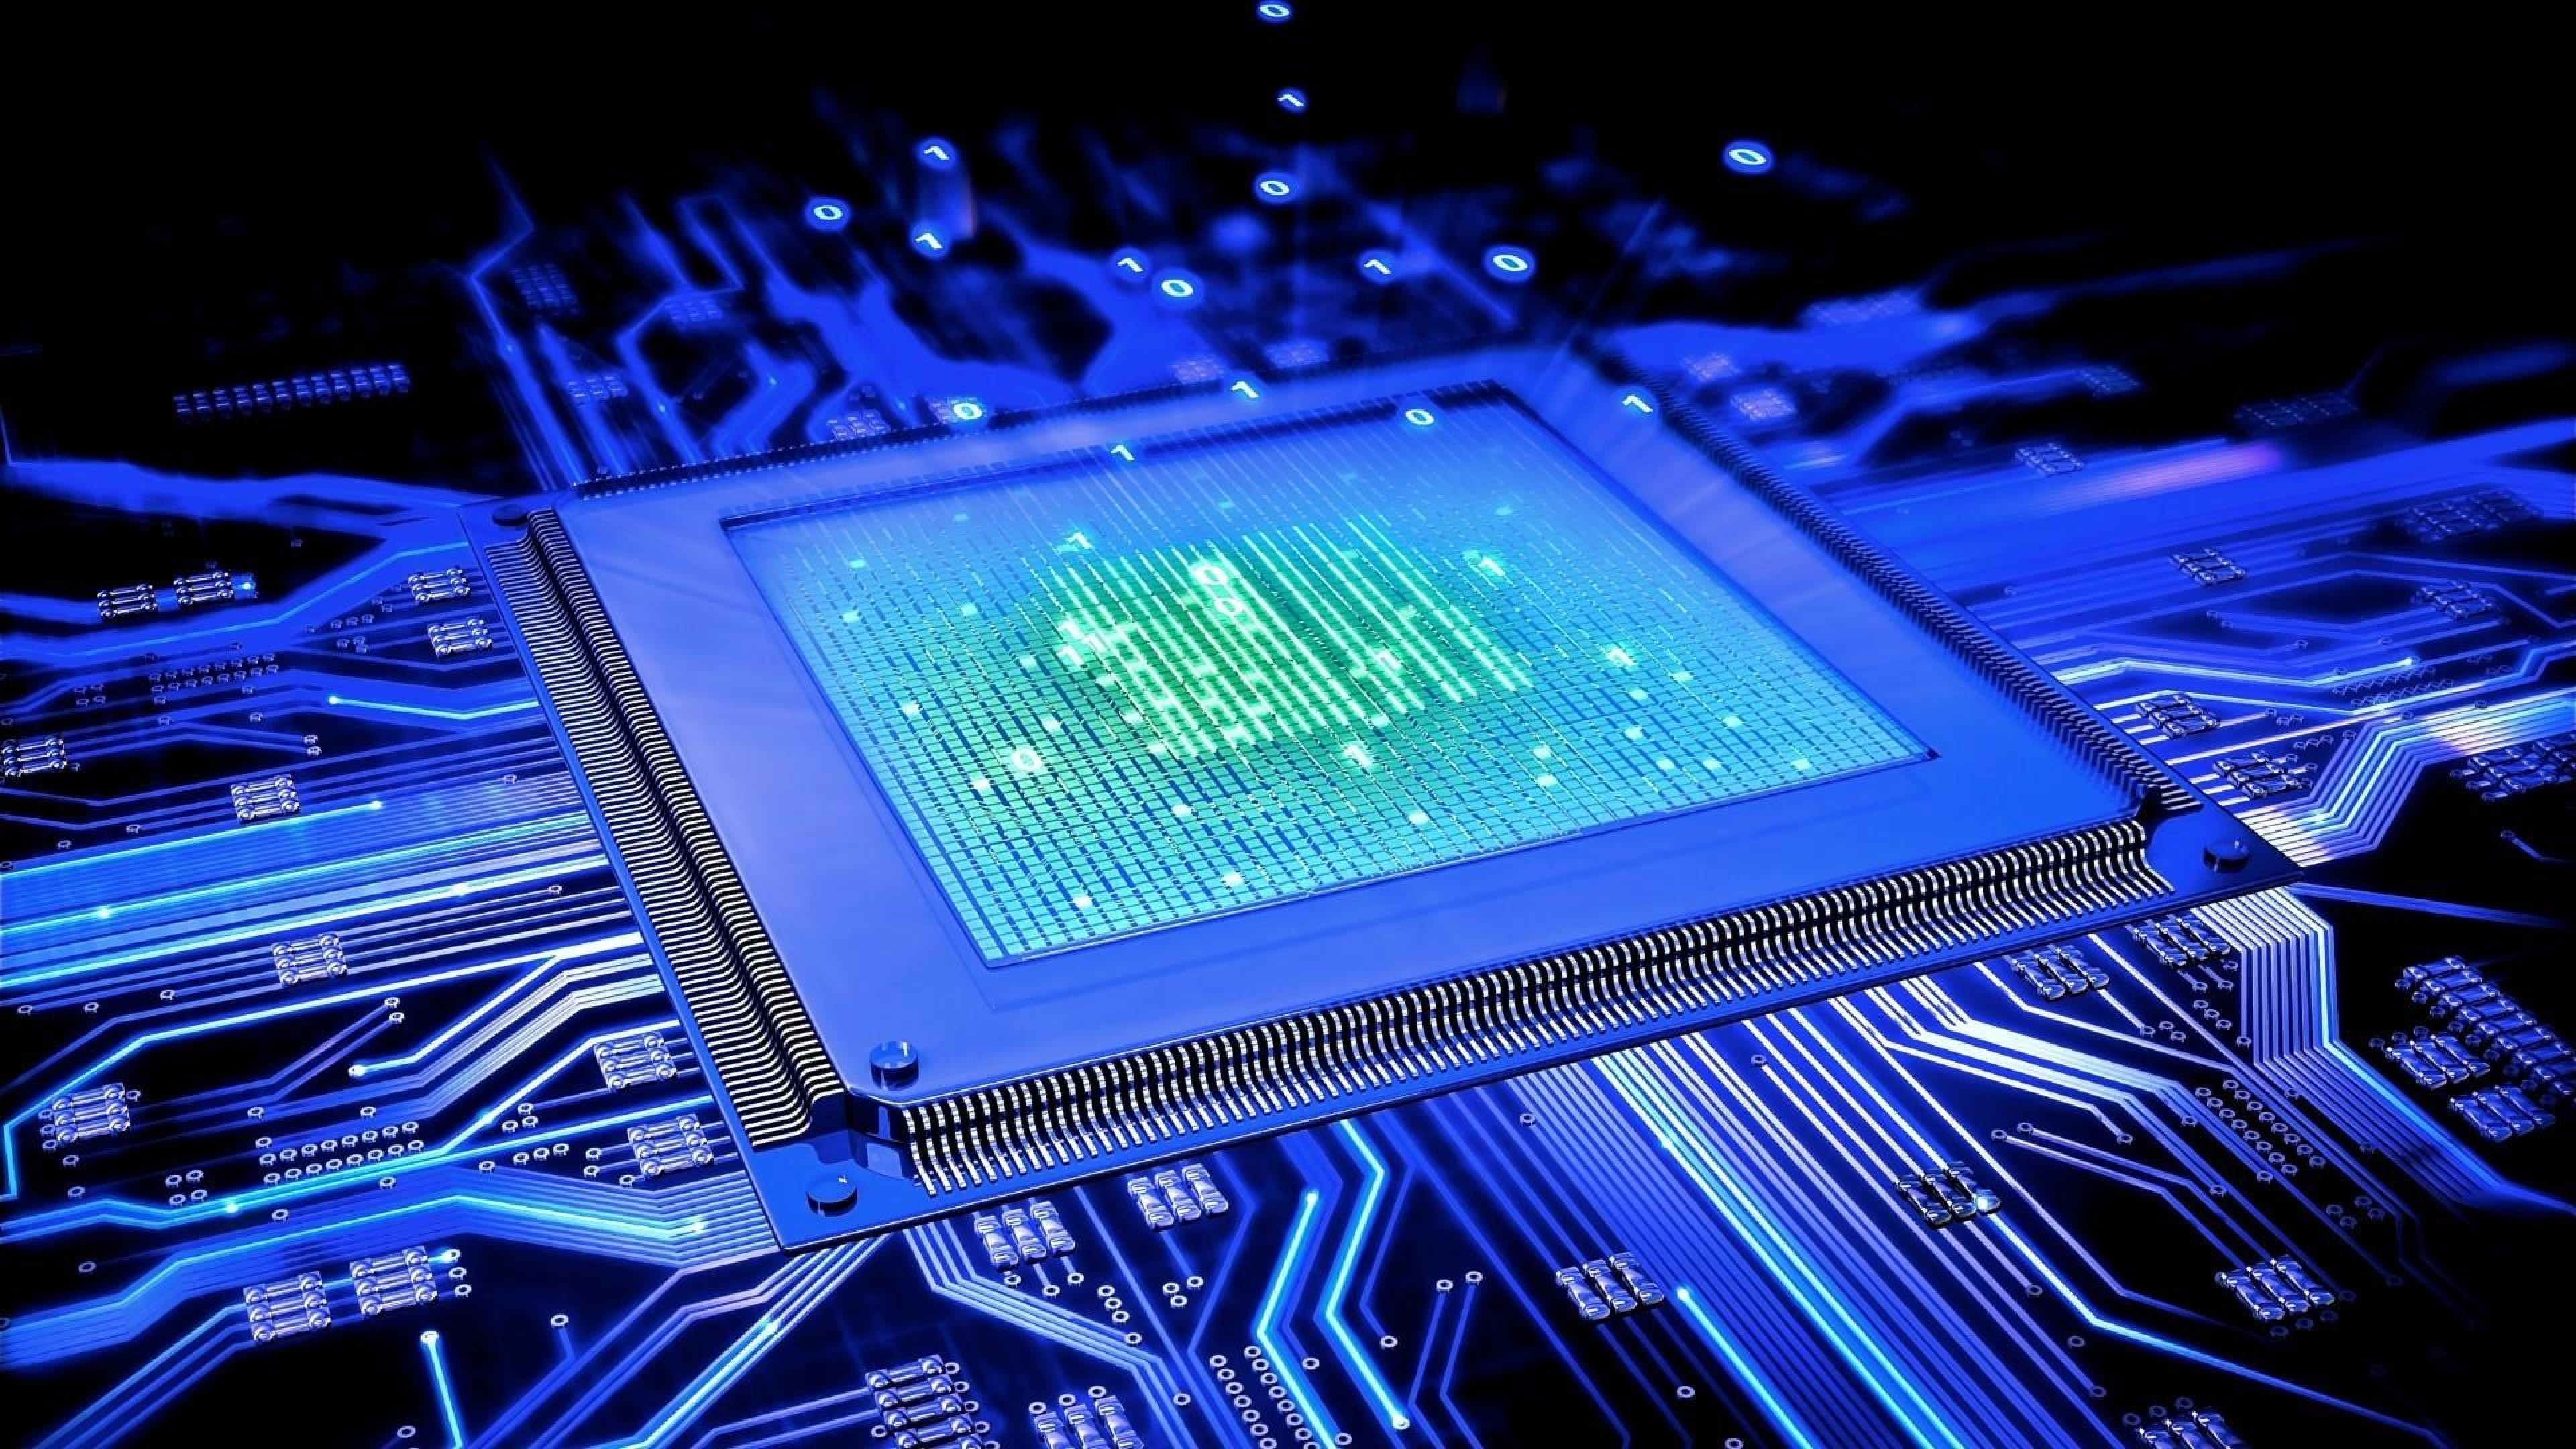 Technology Computer Circuit boards Glowing HD Wallpapers, Desktop .